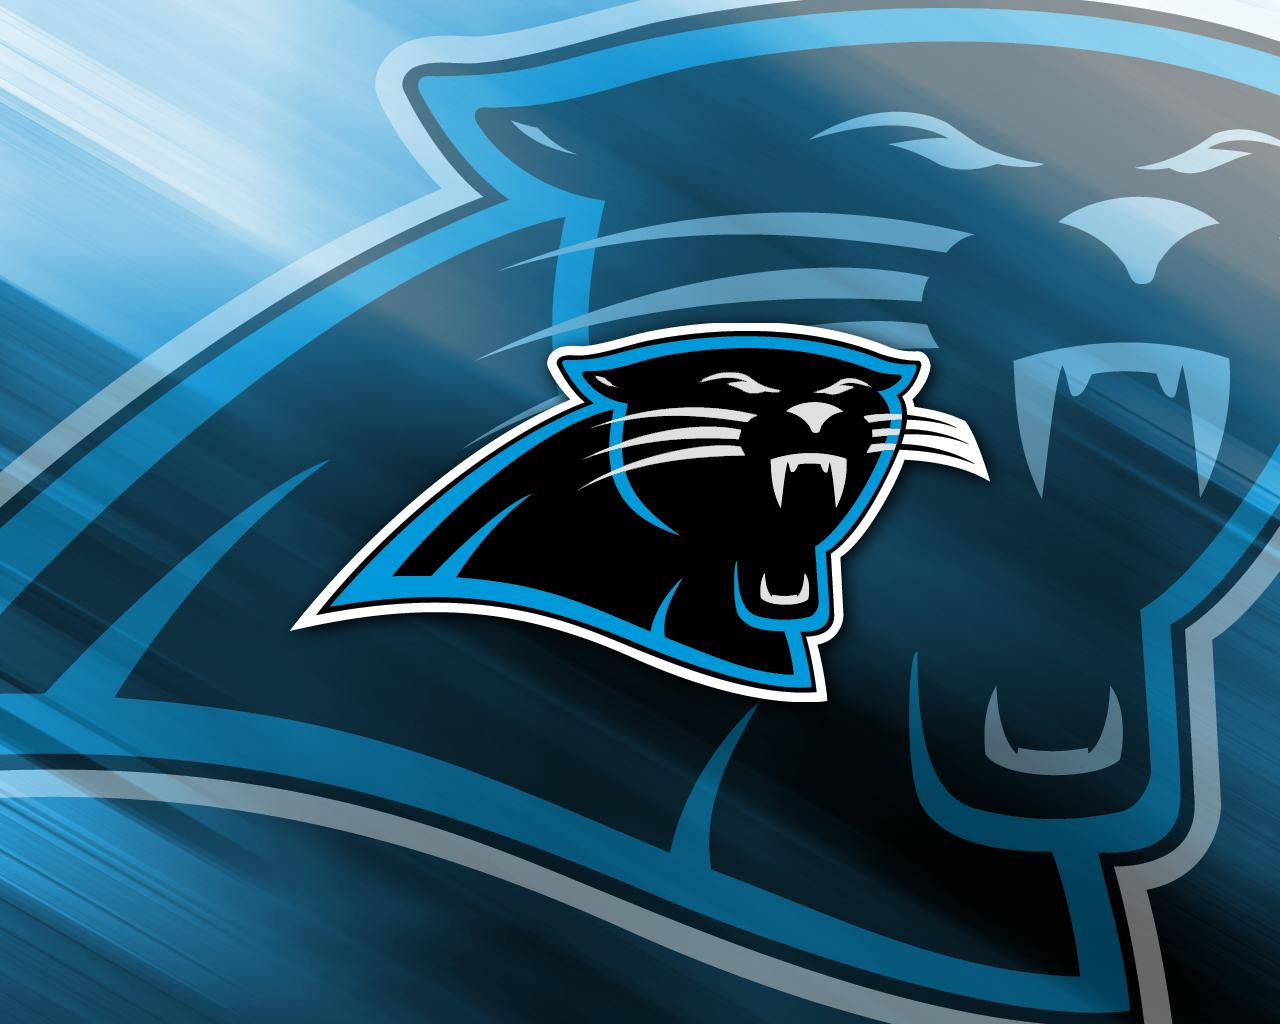 Download Carolina Panthers wallpaper carolina panthers logo 1280x1024